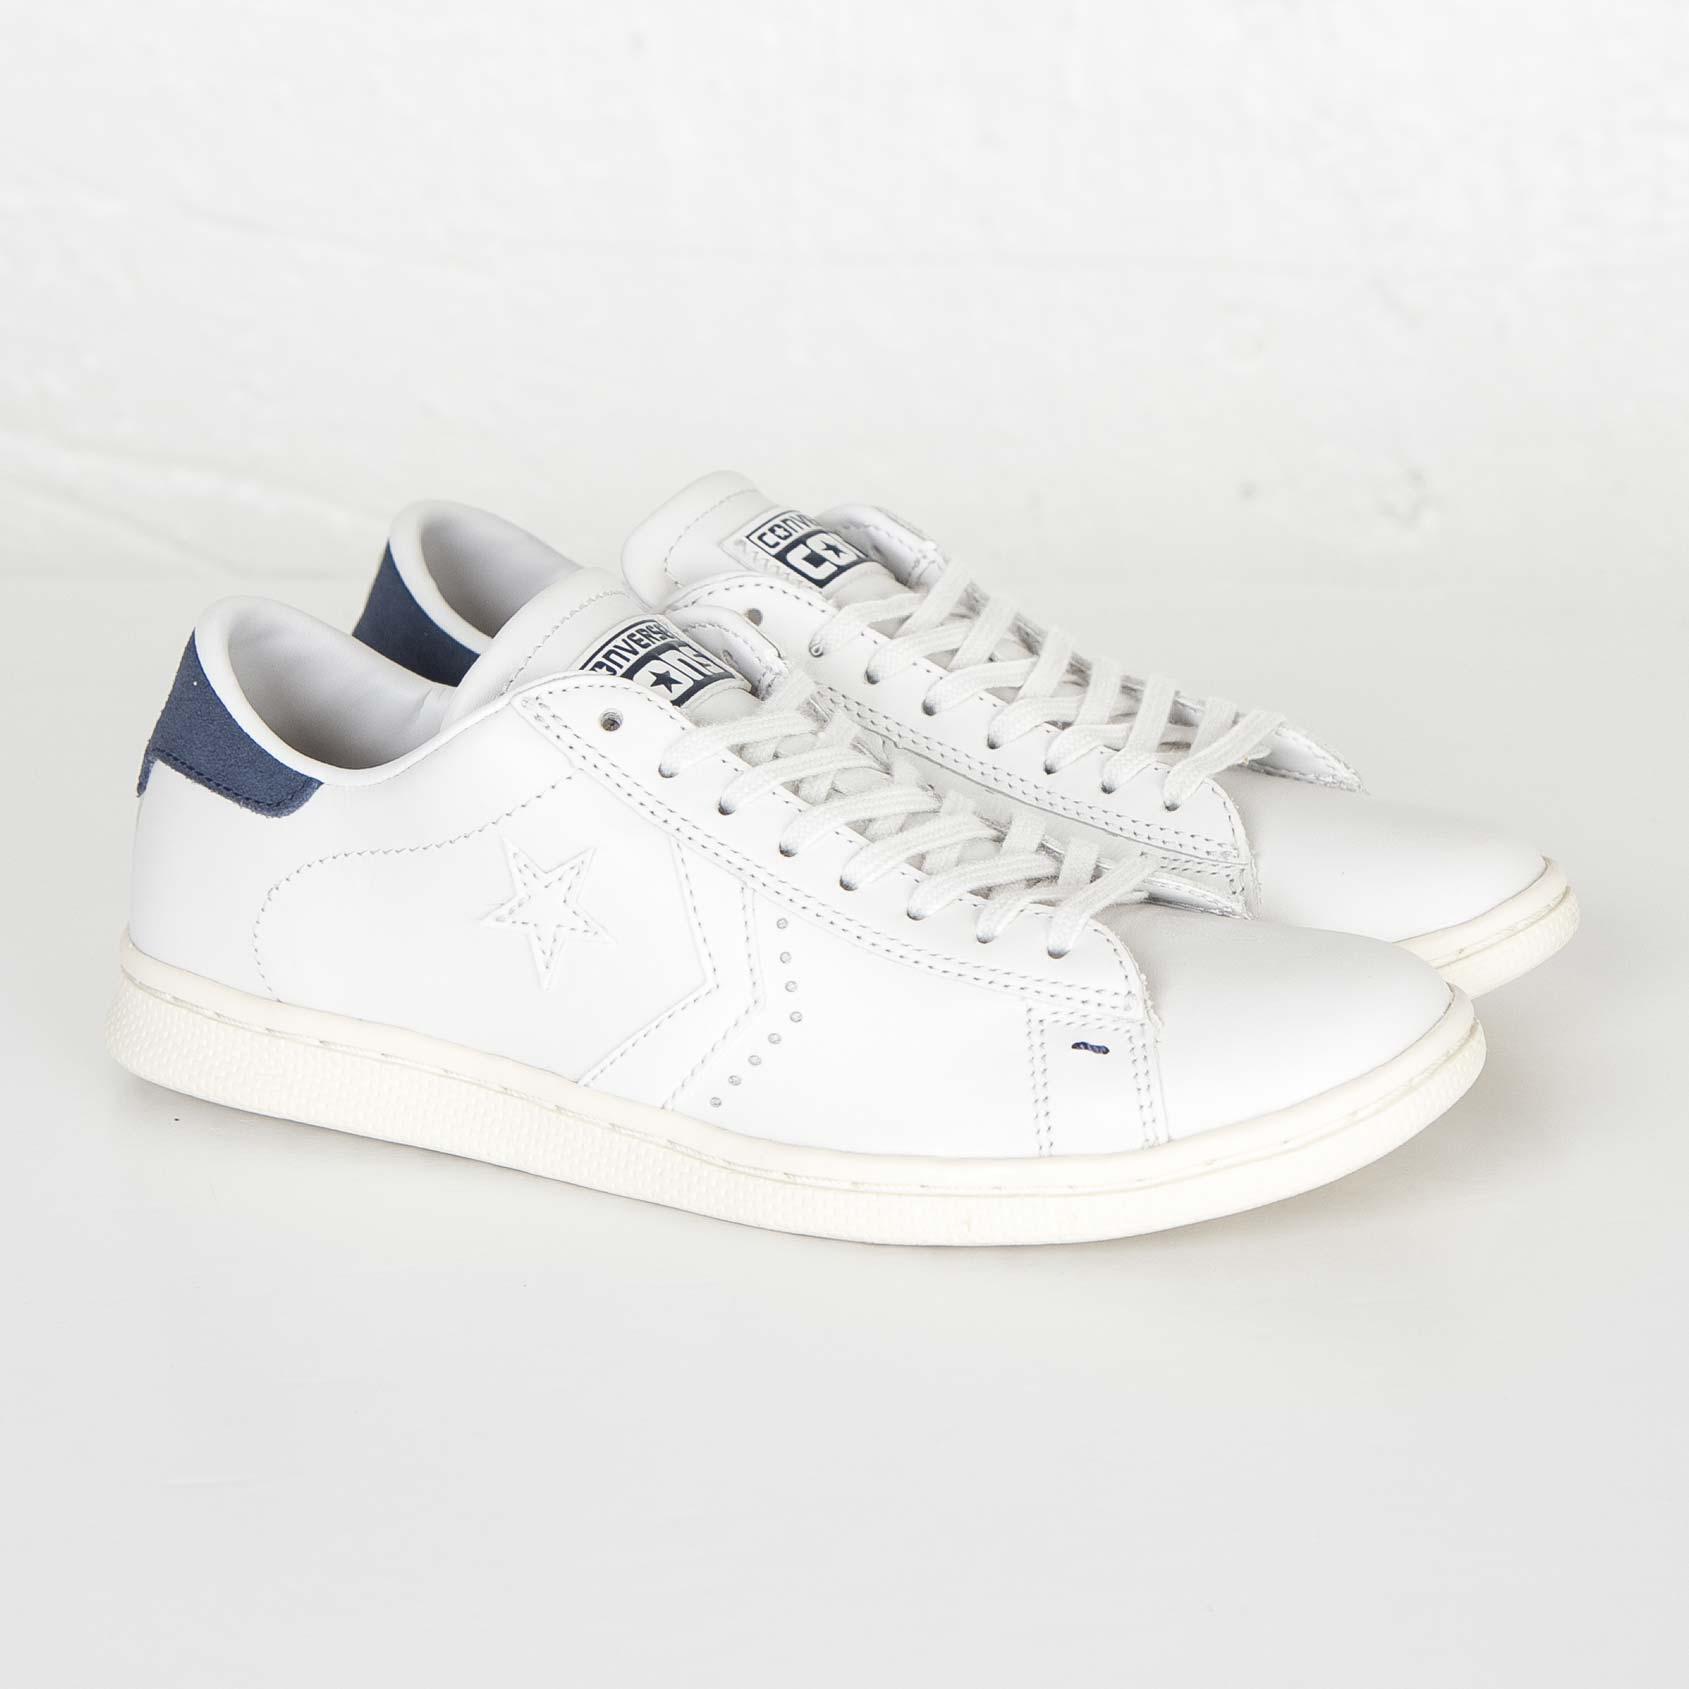 Work Vans For Sale >> Converse Pro Leather LP-Ox - 147789c - Sneakersnstuff ...